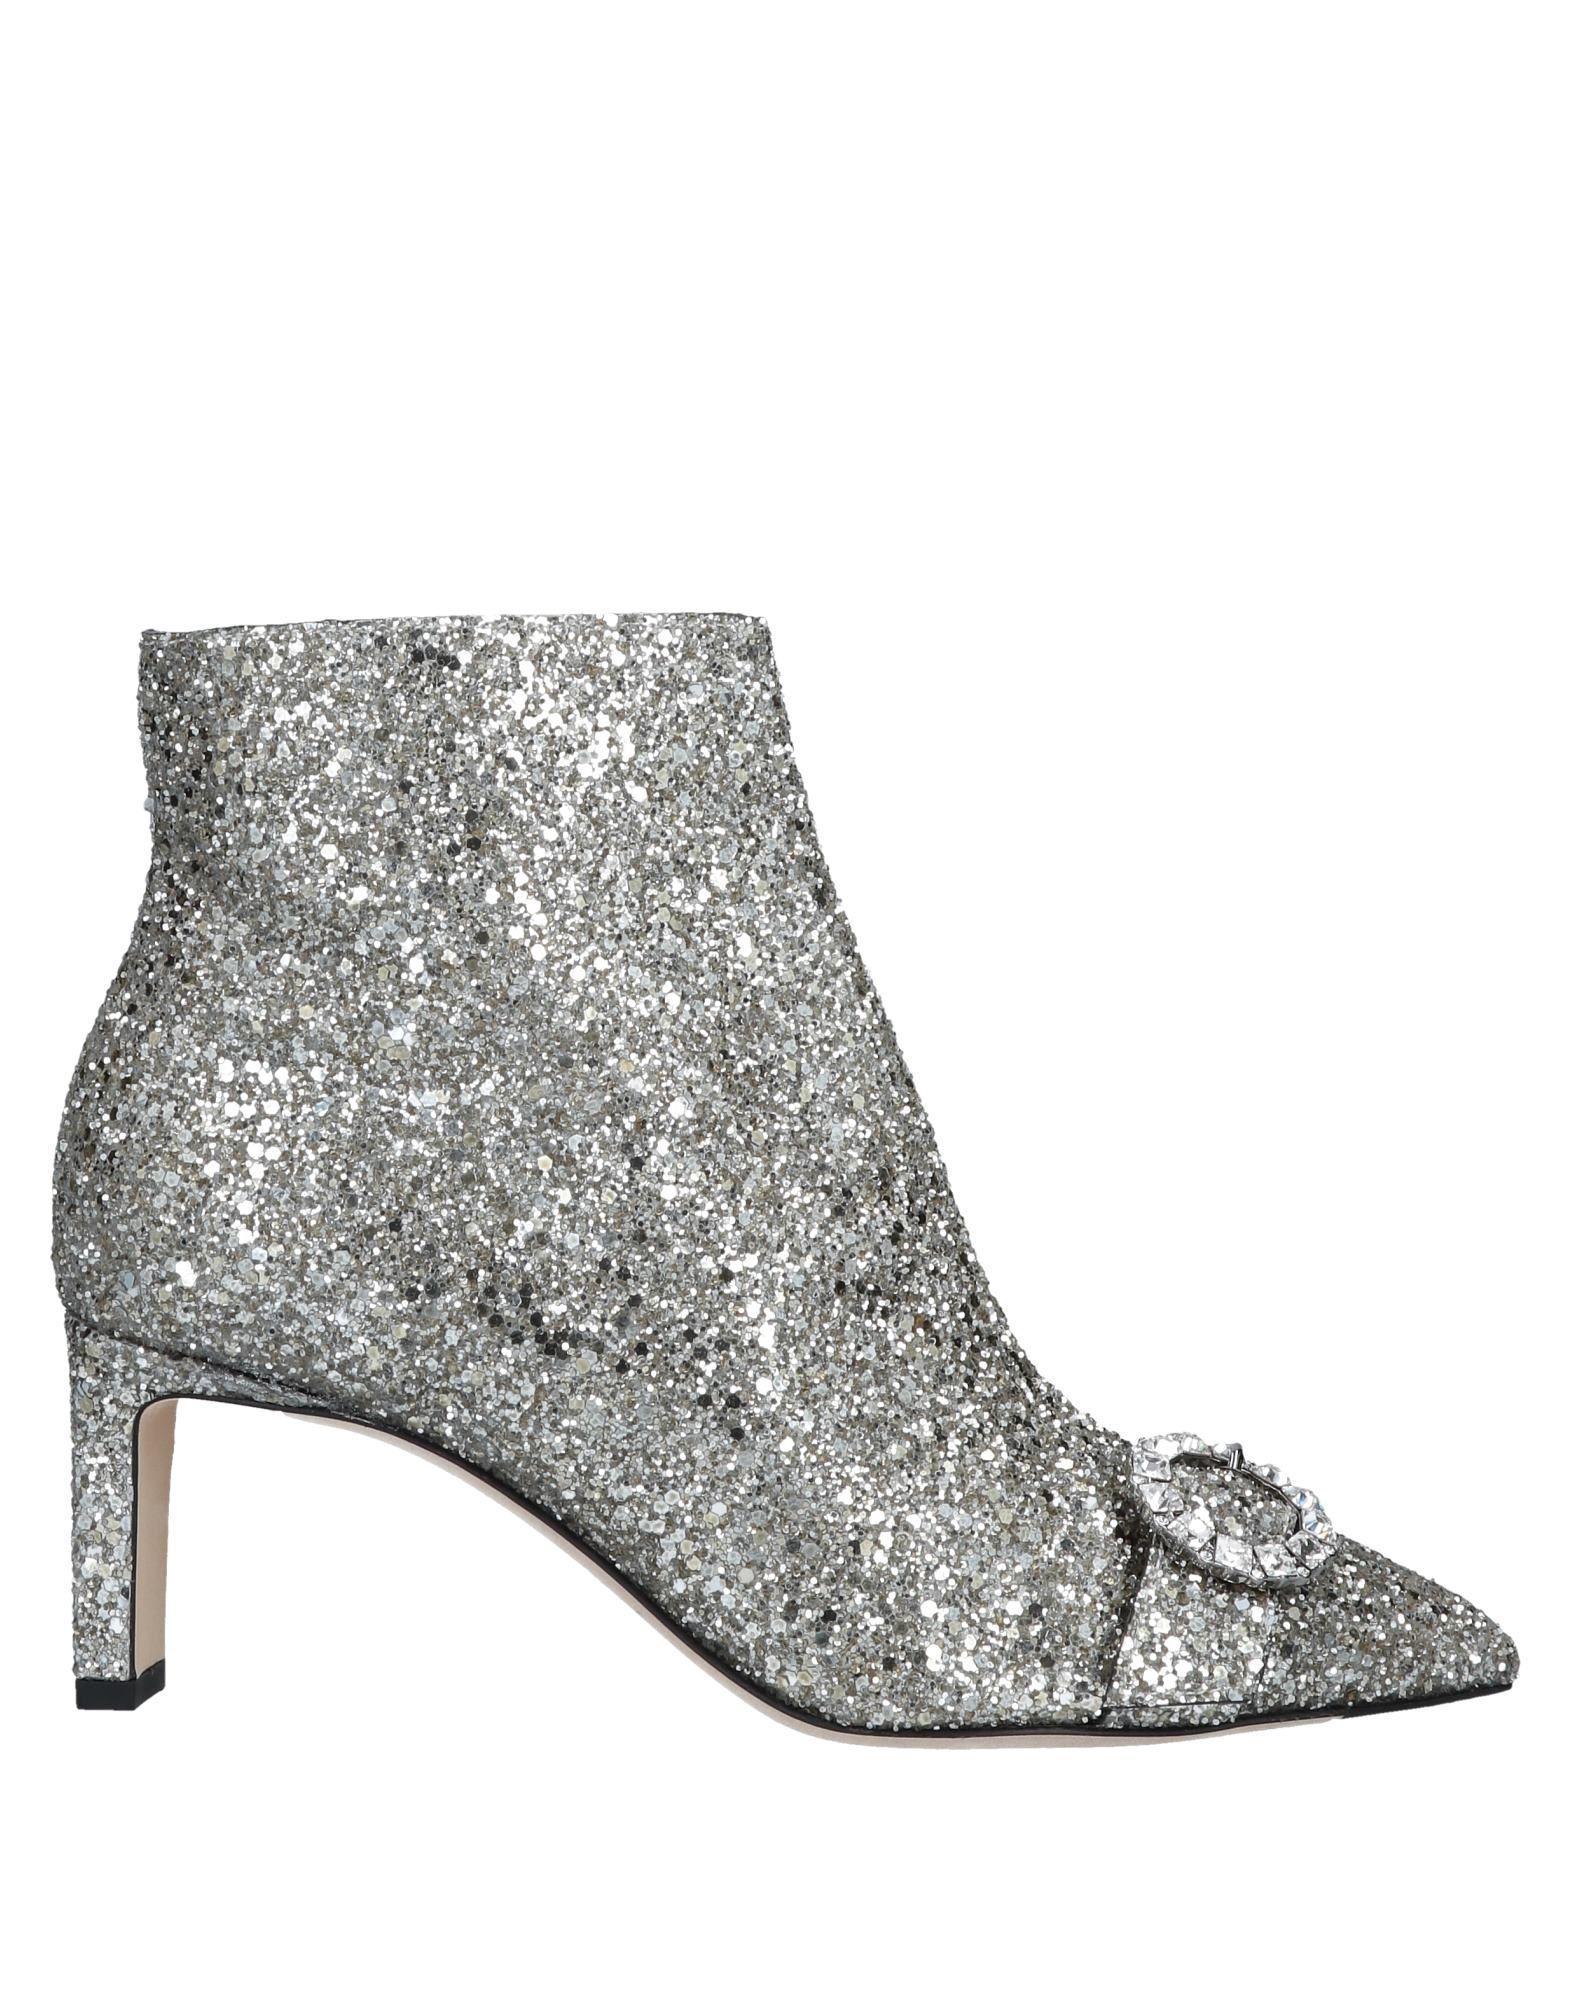 ace8ffbcd5b Lyst - Jimmy Choo Boots Hanover 65 Fabric Glitter Silver Buckle in ...